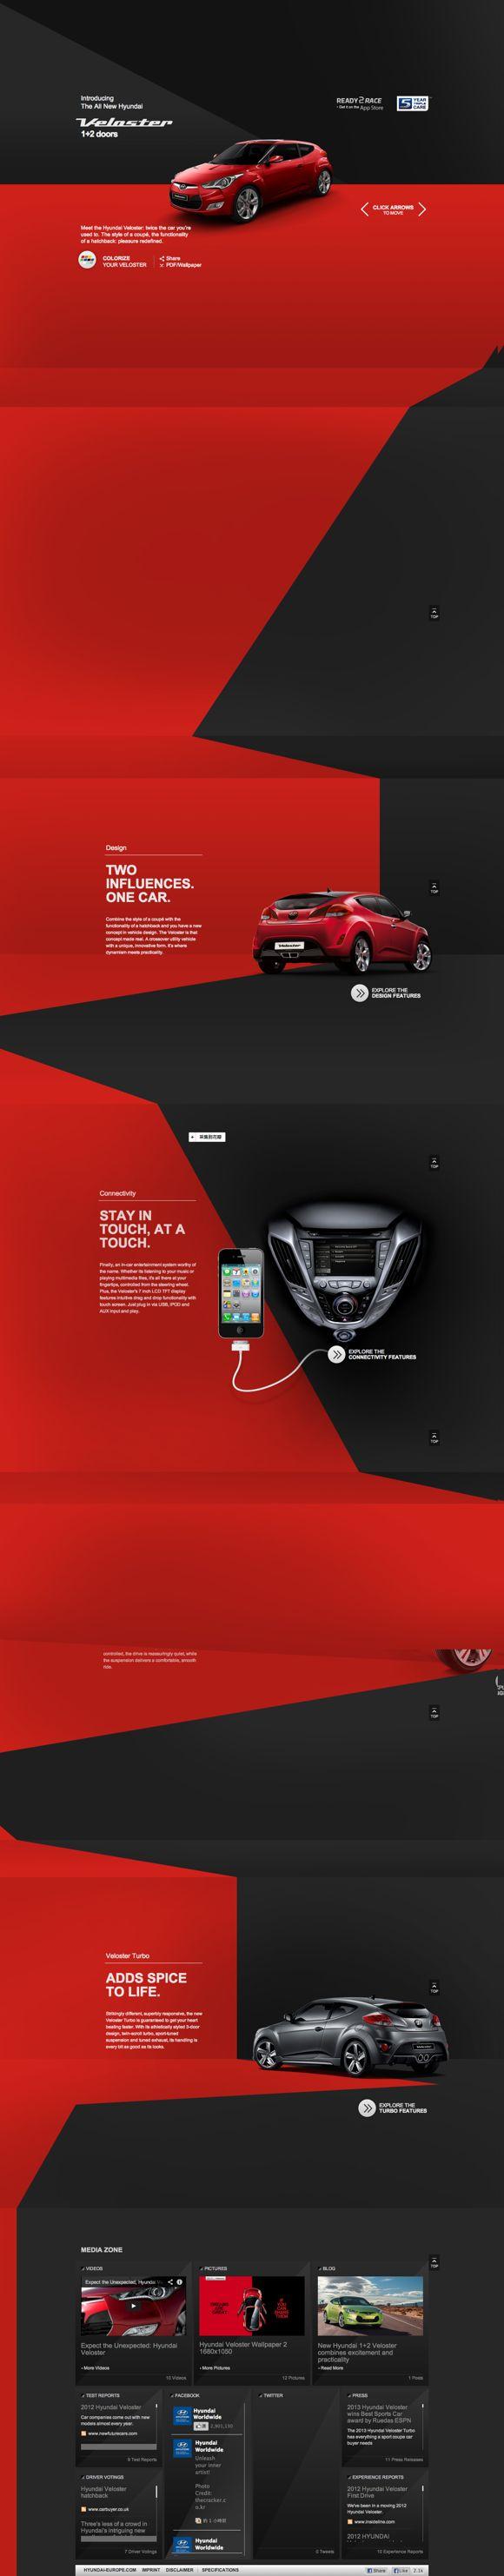 Hyundai Veloster | Official Site, Hyundai Motor Europe  #hyundai #veloster #car #webdesign